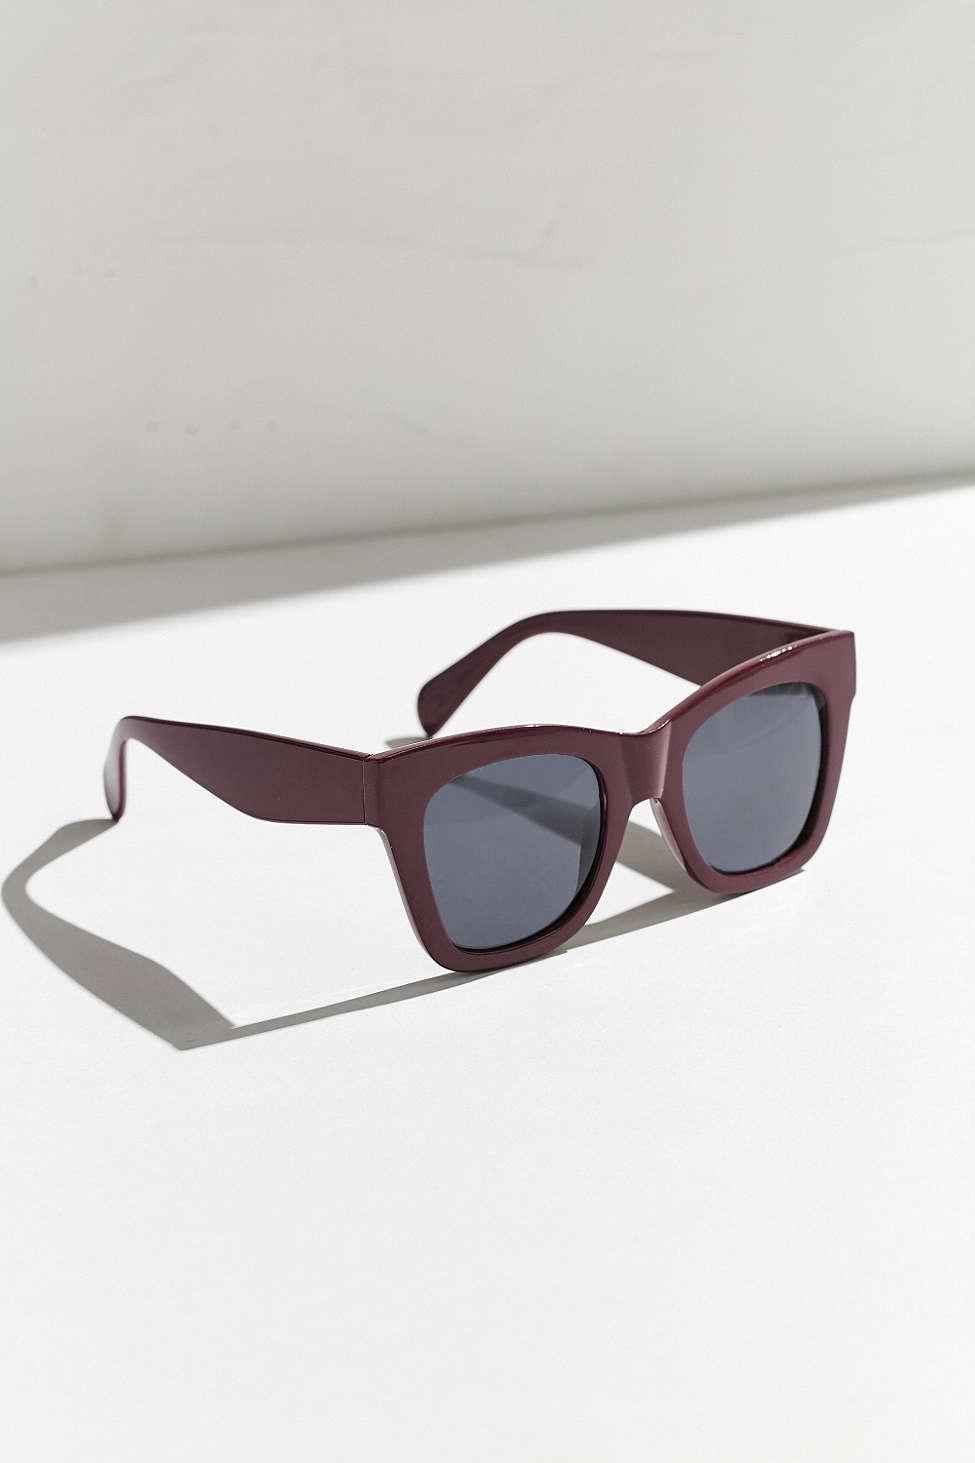 Simone Chunky Square Sunglasses $16.jpg